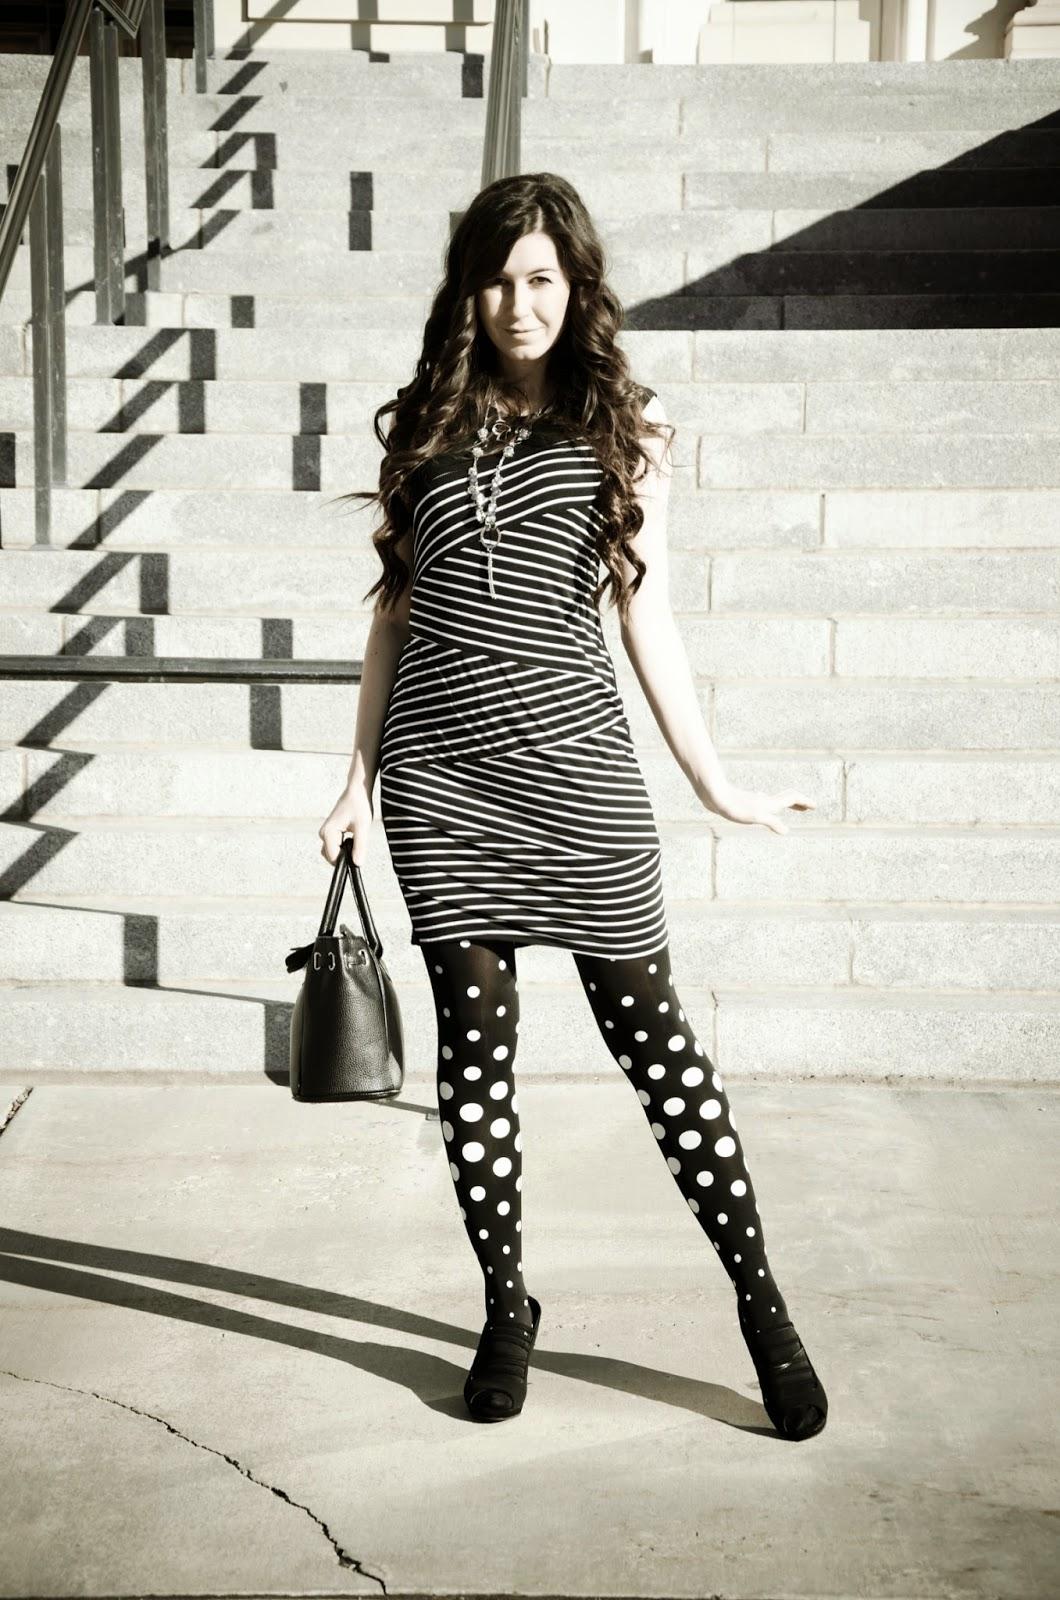 polka dots and stripes, polka dot tights, zig zag dress, black and white, black and white dress, black and white tights, striped dress with polka dot tights outfit, polka dot outfit, wedges,